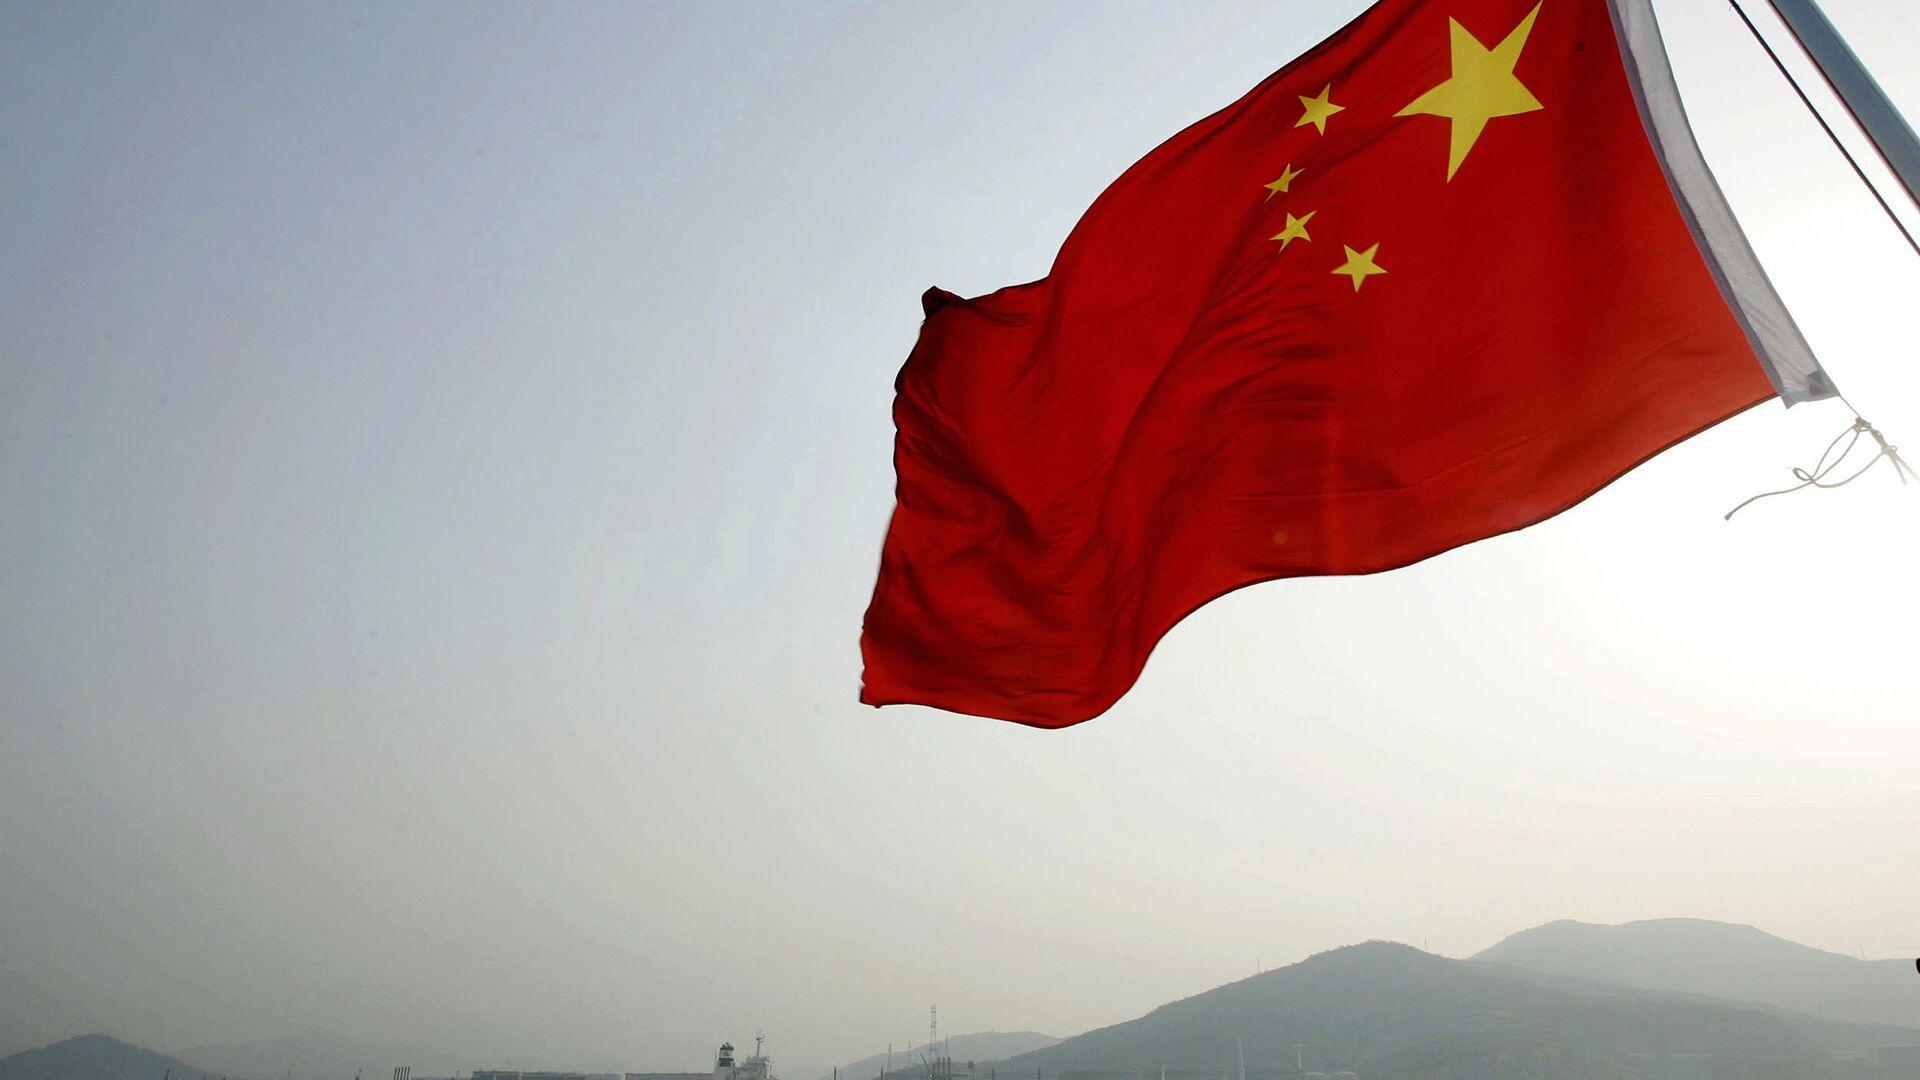 La bandiera cinese - Sputnik Italia, 1920, 09.04.2021